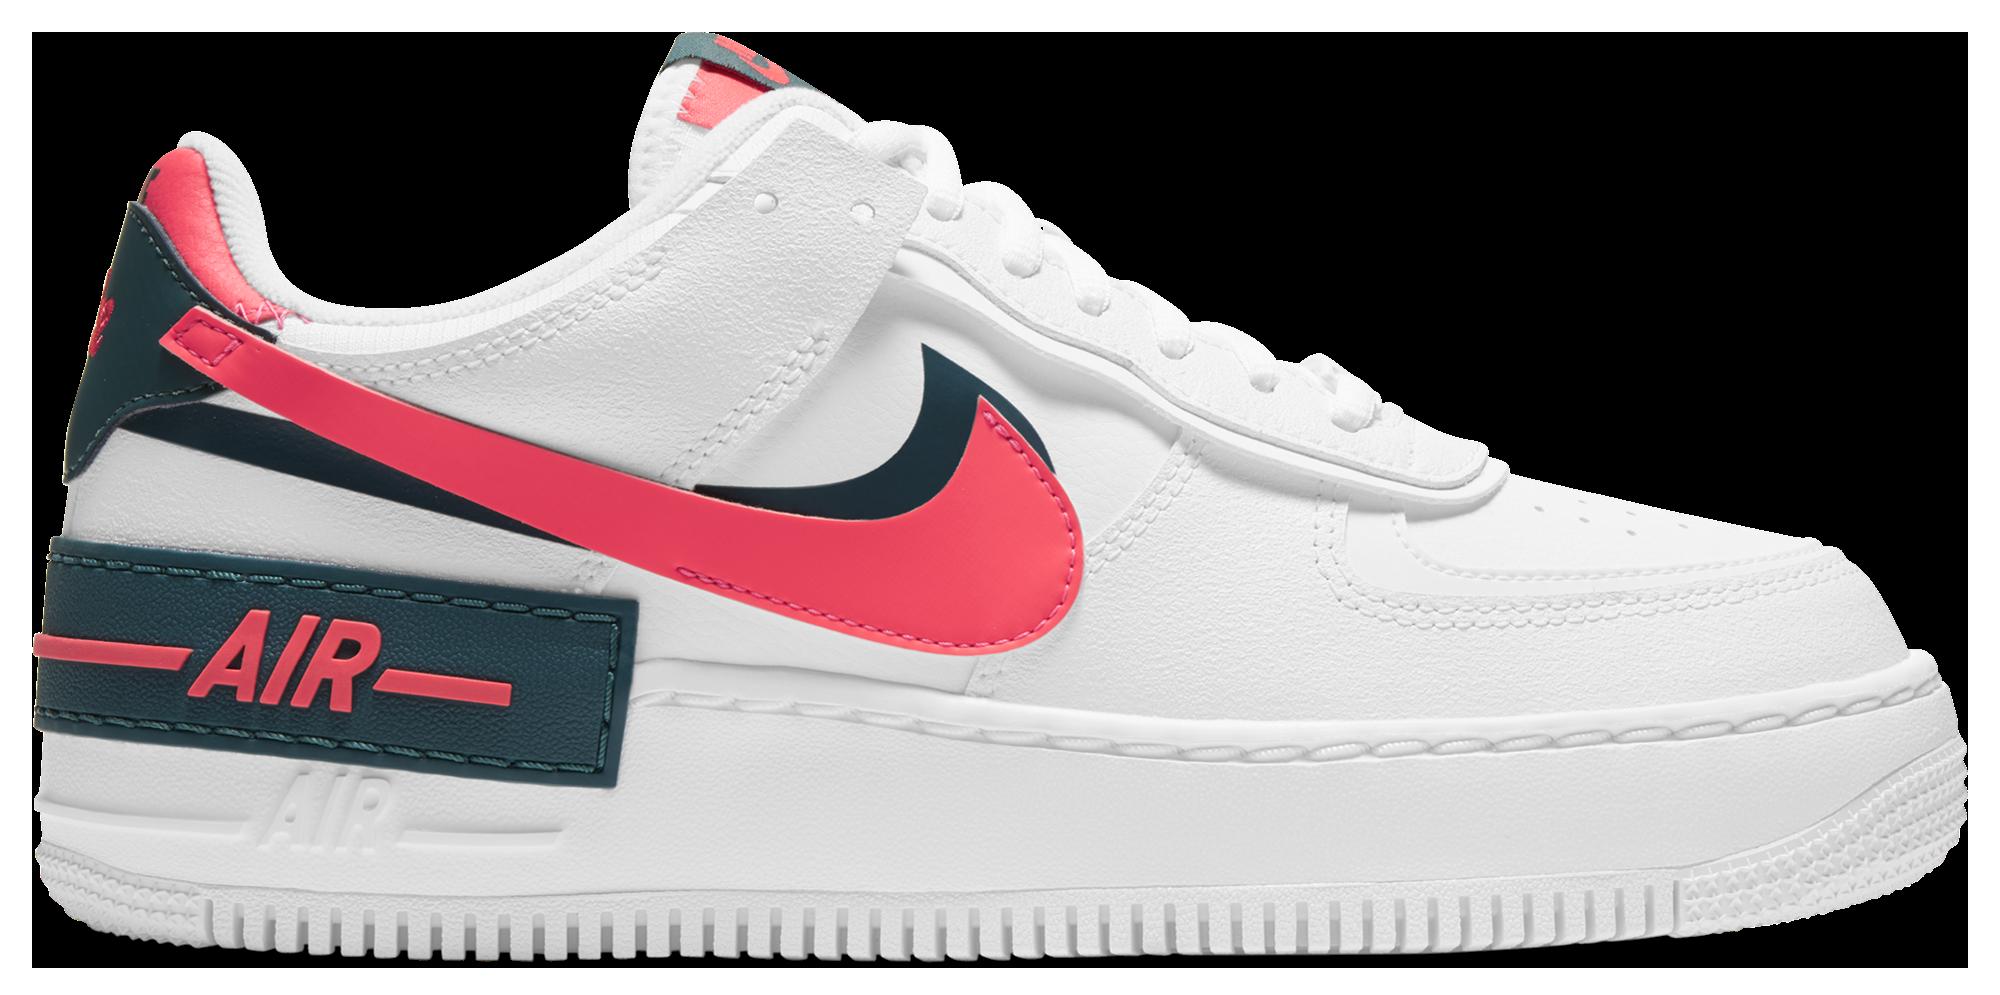 Nike Air Force 1 Shadow - Women's | Foot Locker